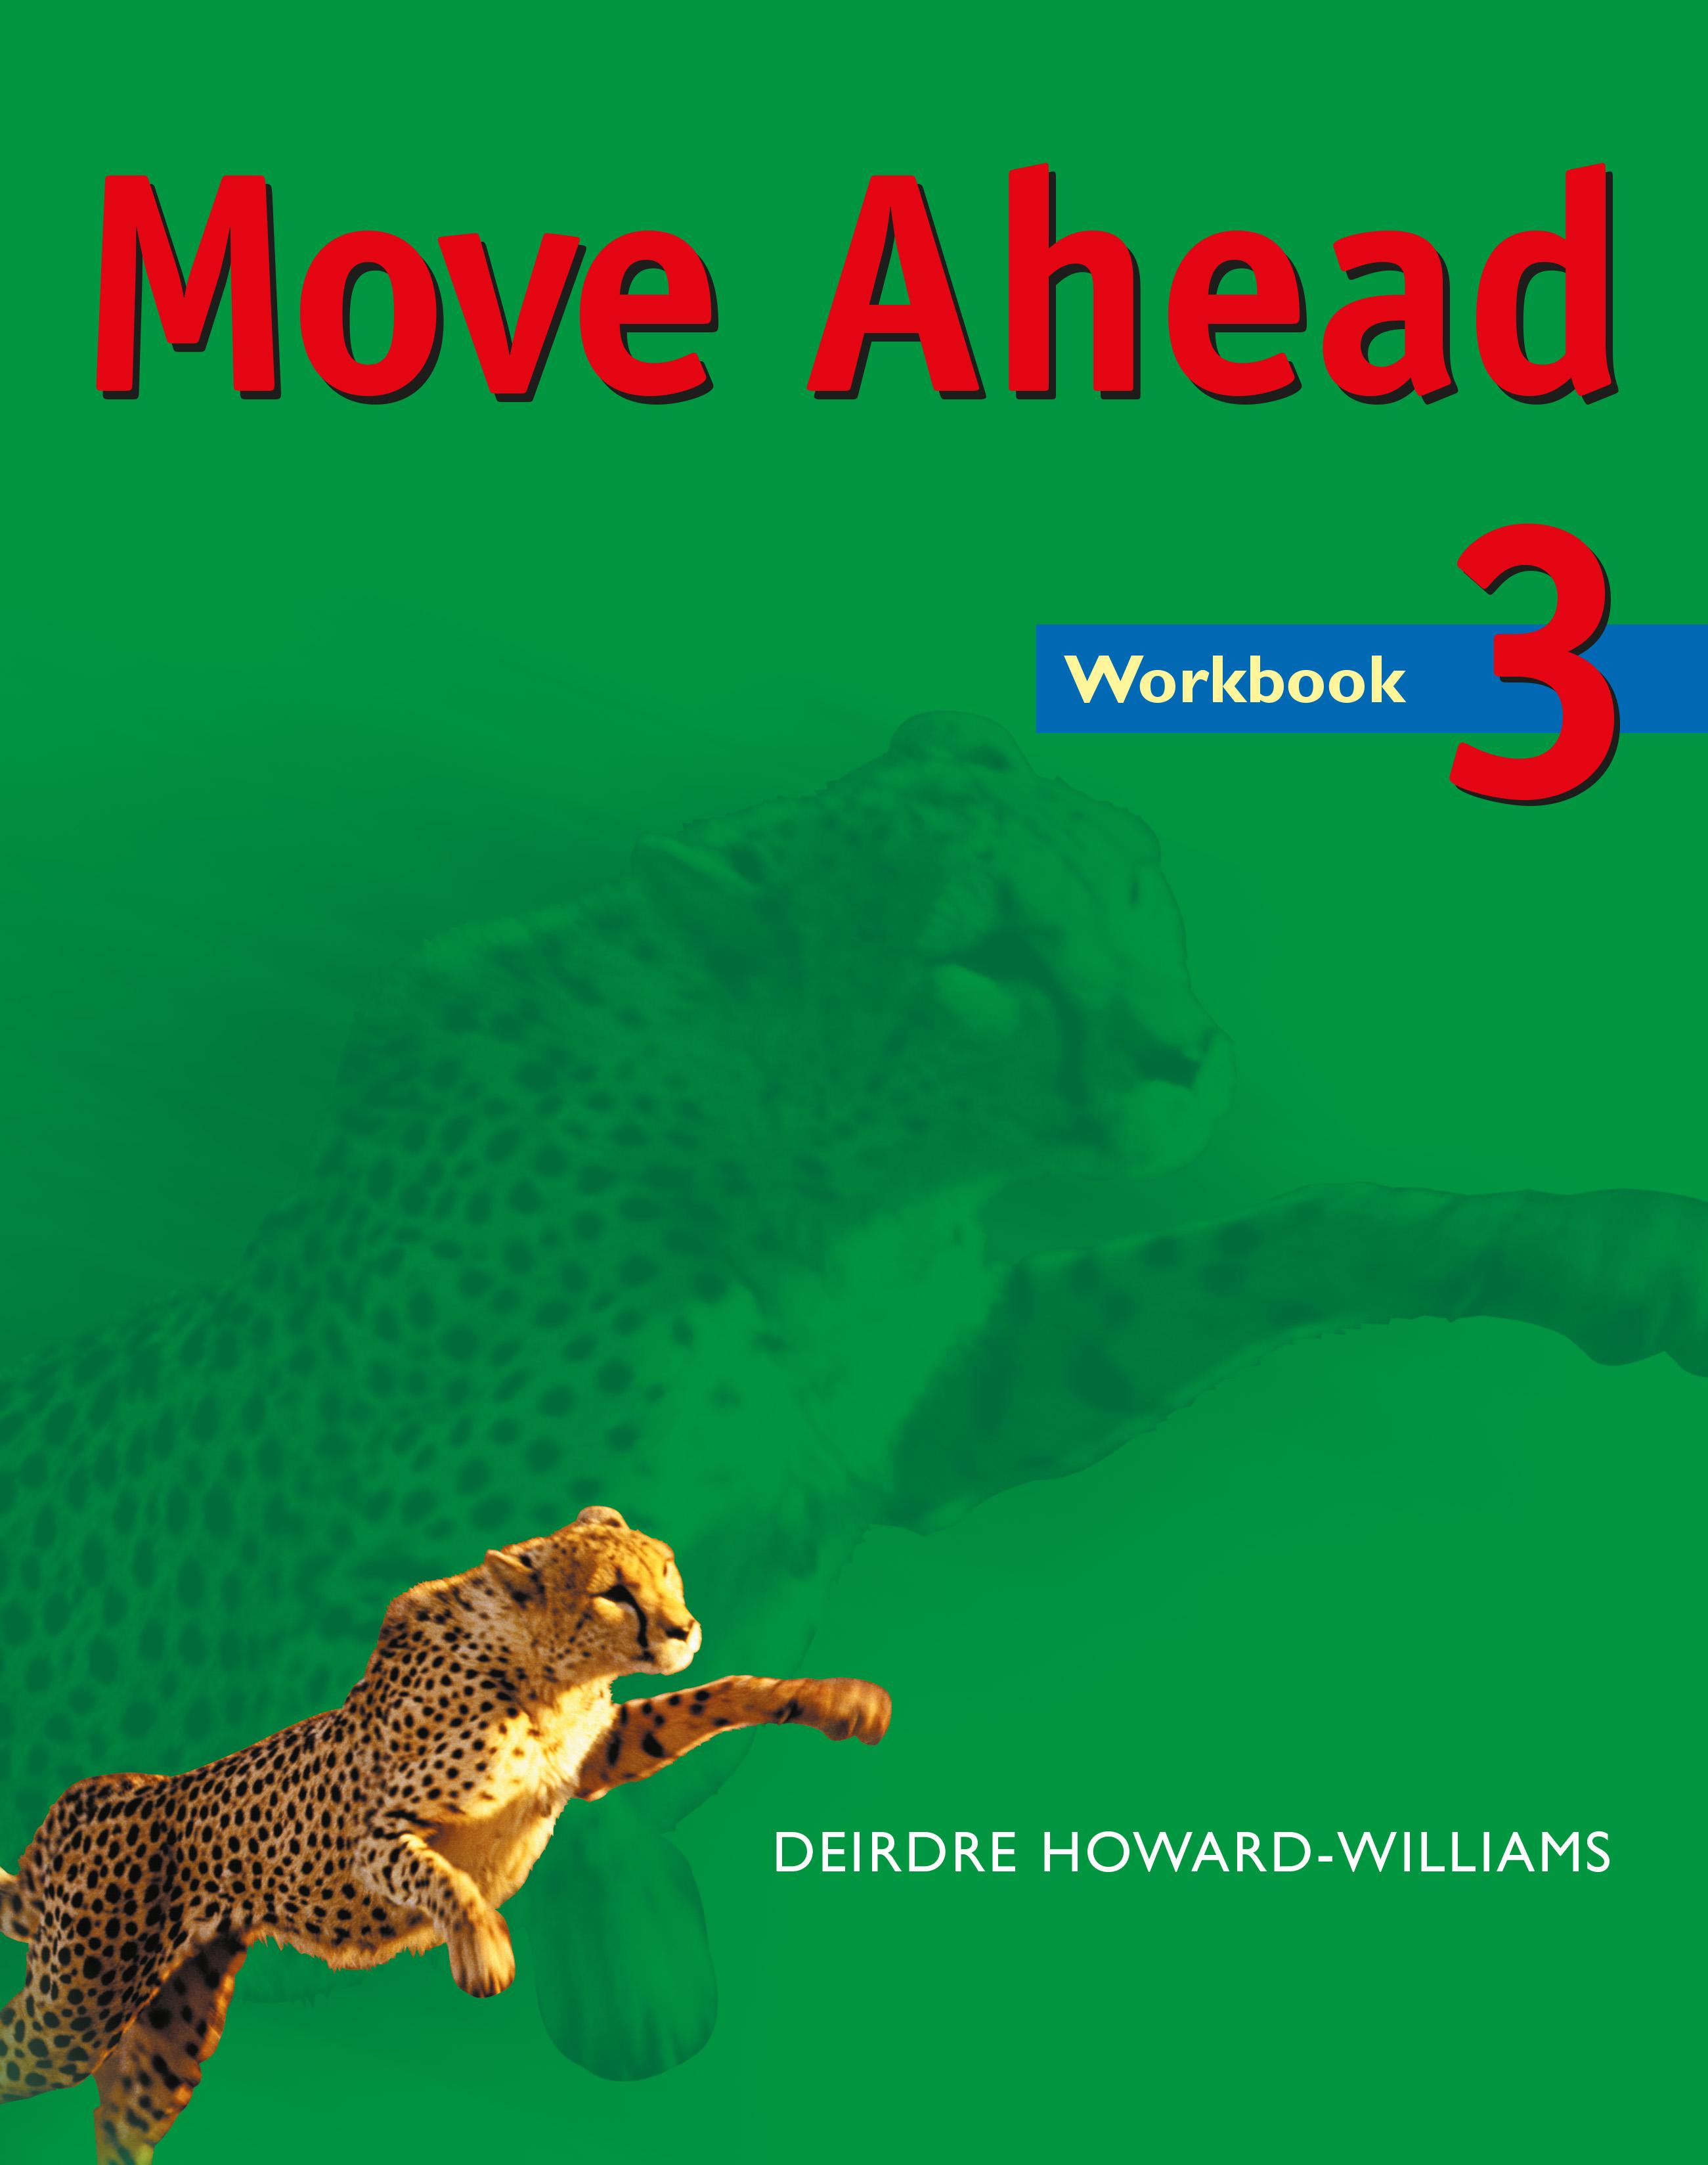 Move Ahead 3 Workbook